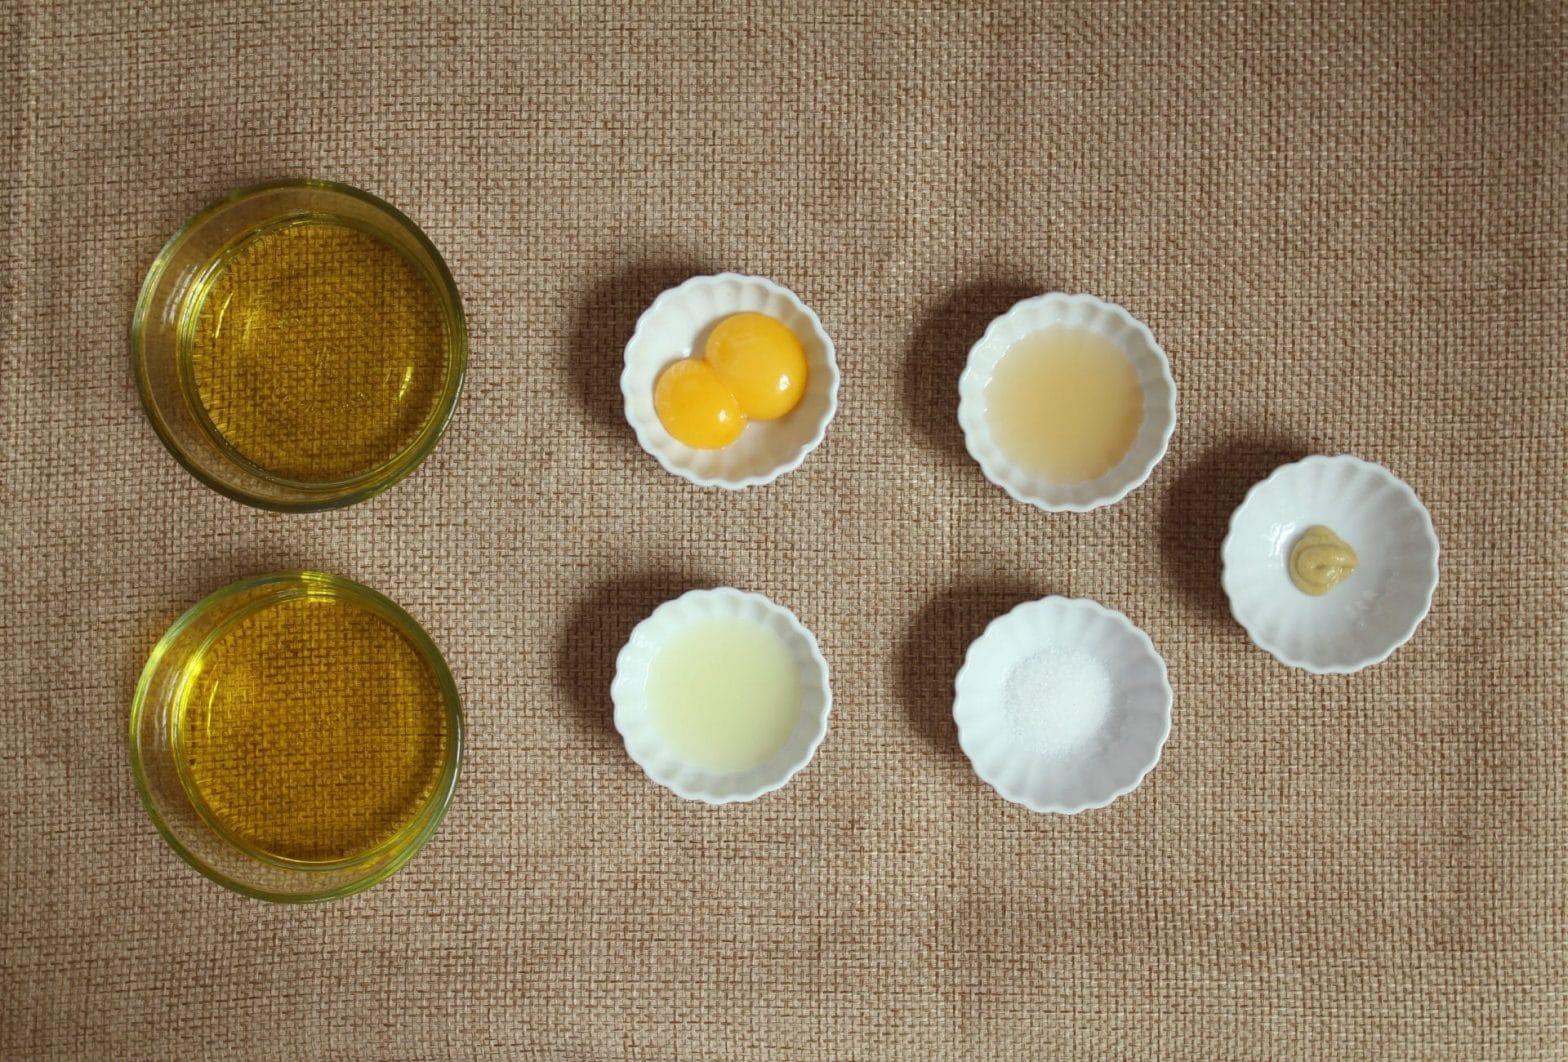 Homemade Olive Oil Mayonnaise